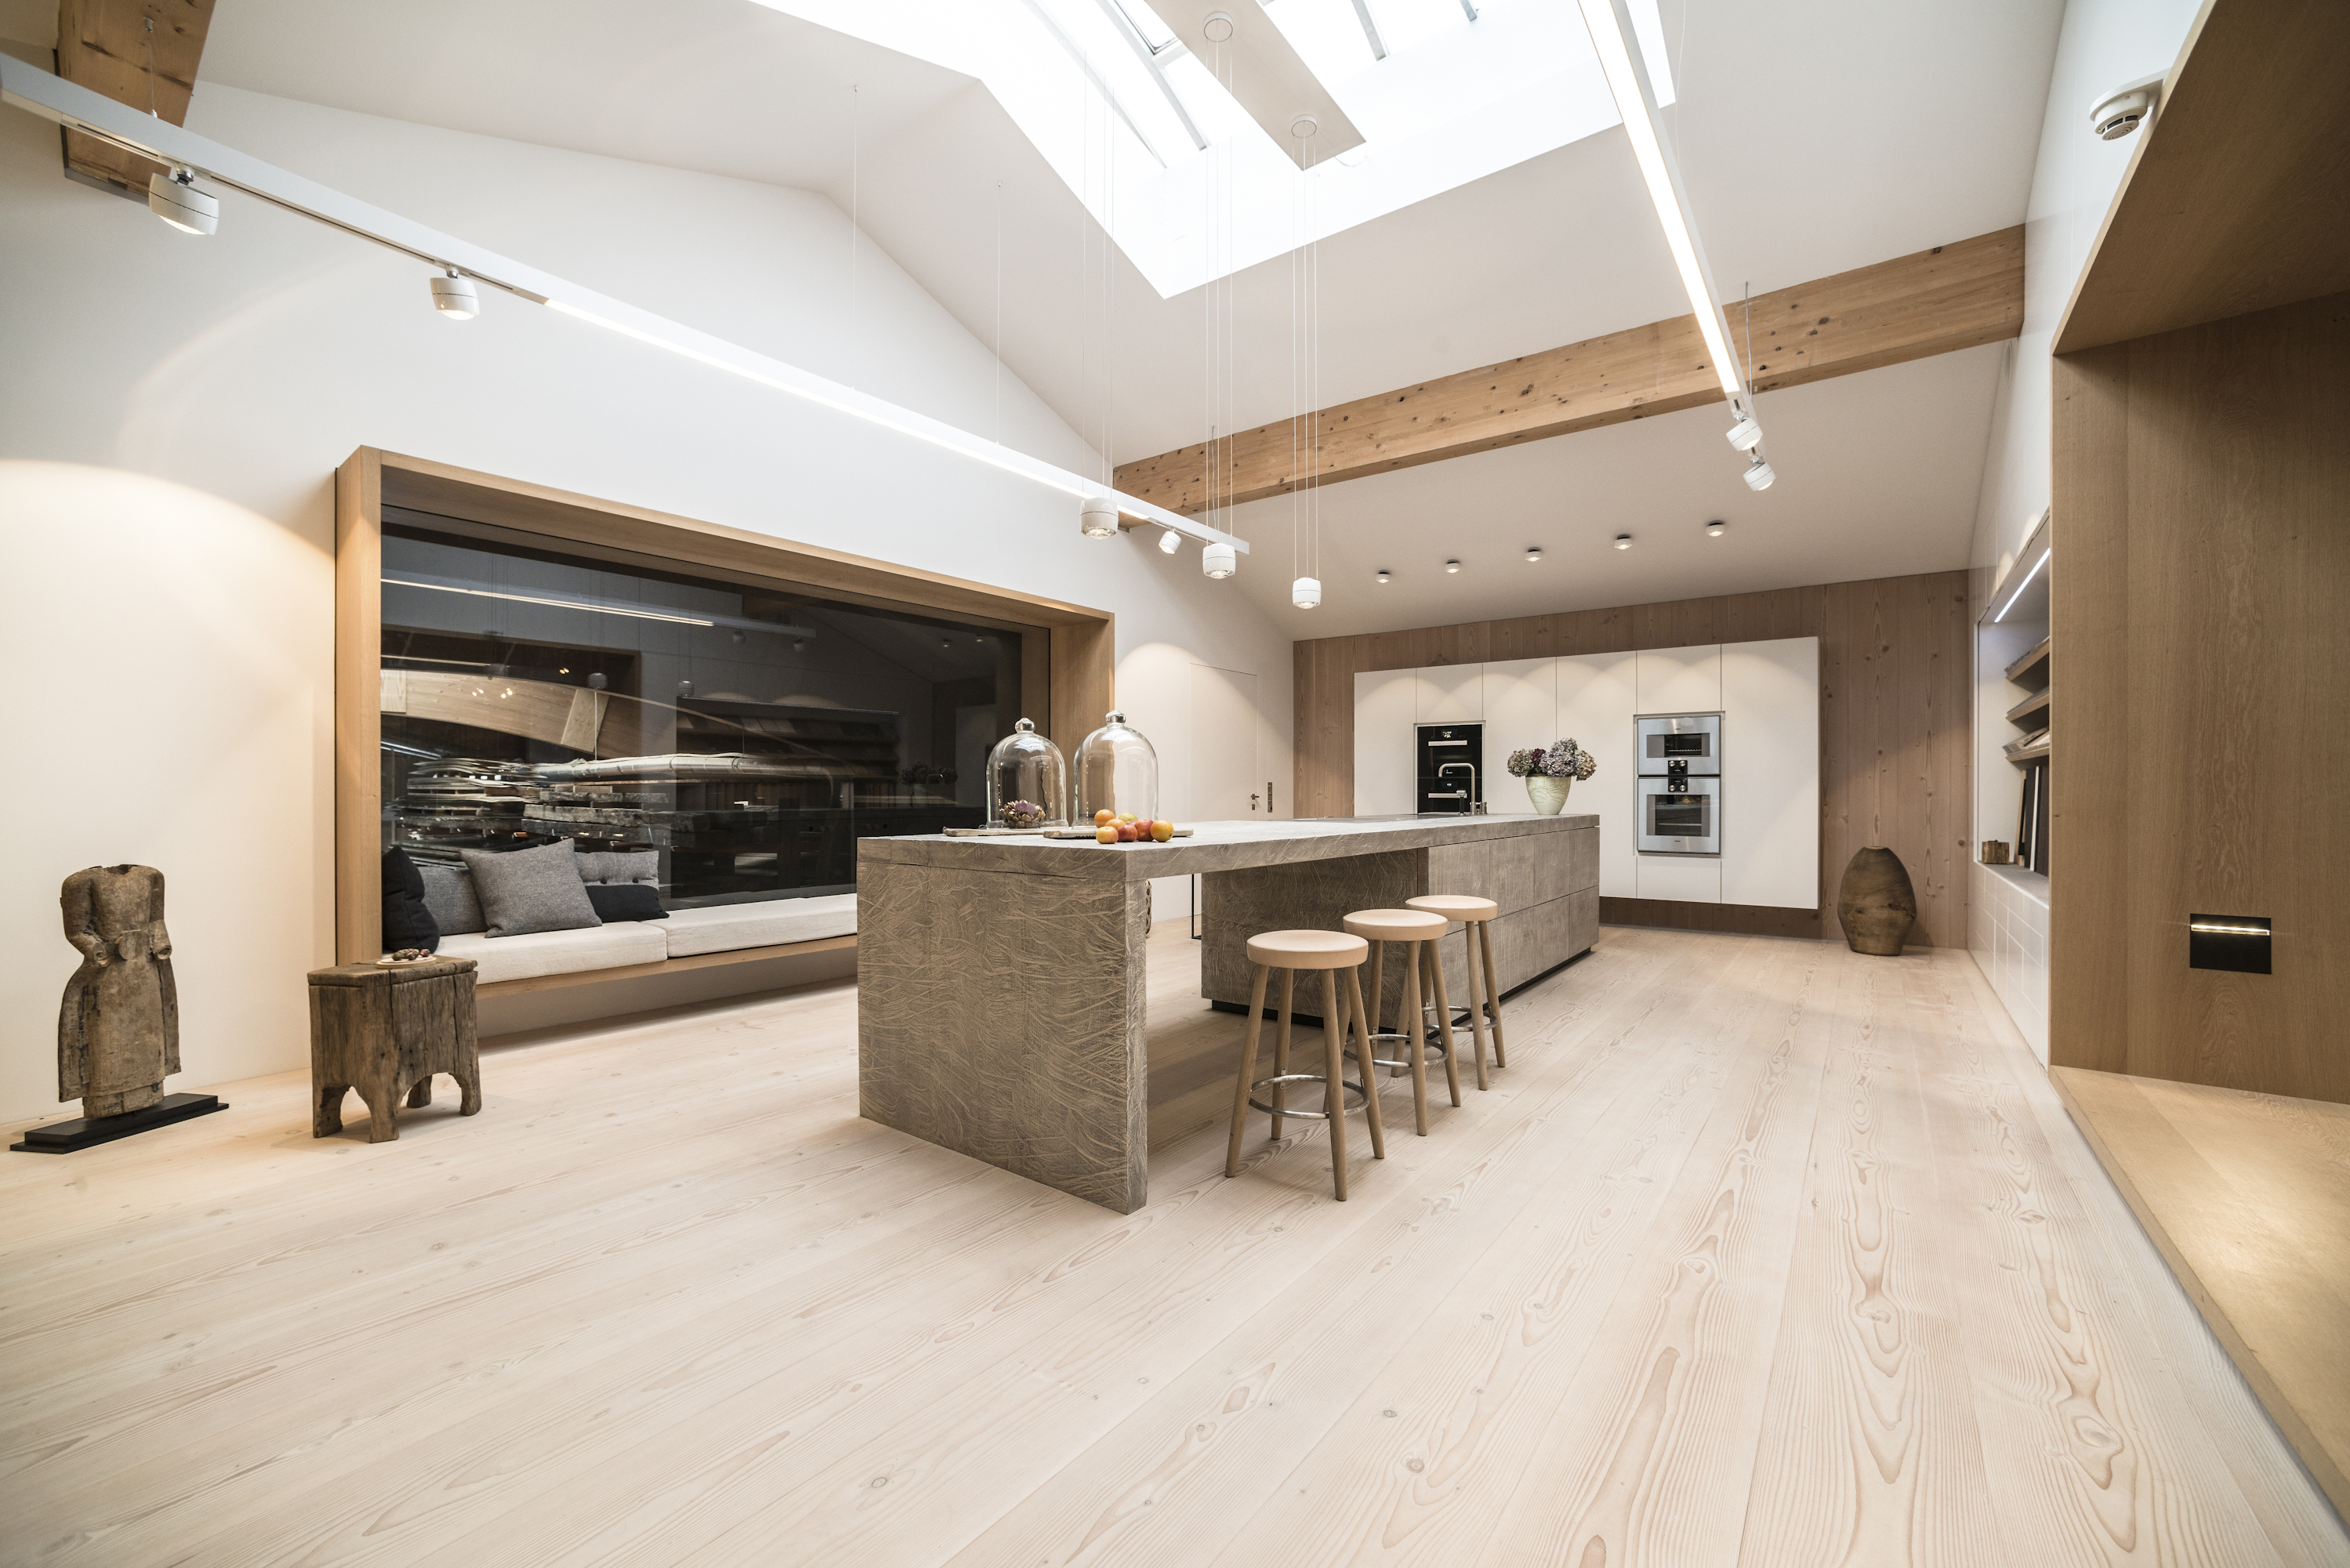 douglasie bodendielen made in germany interiorpark. Black Bedroom Furniture Sets. Home Design Ideas